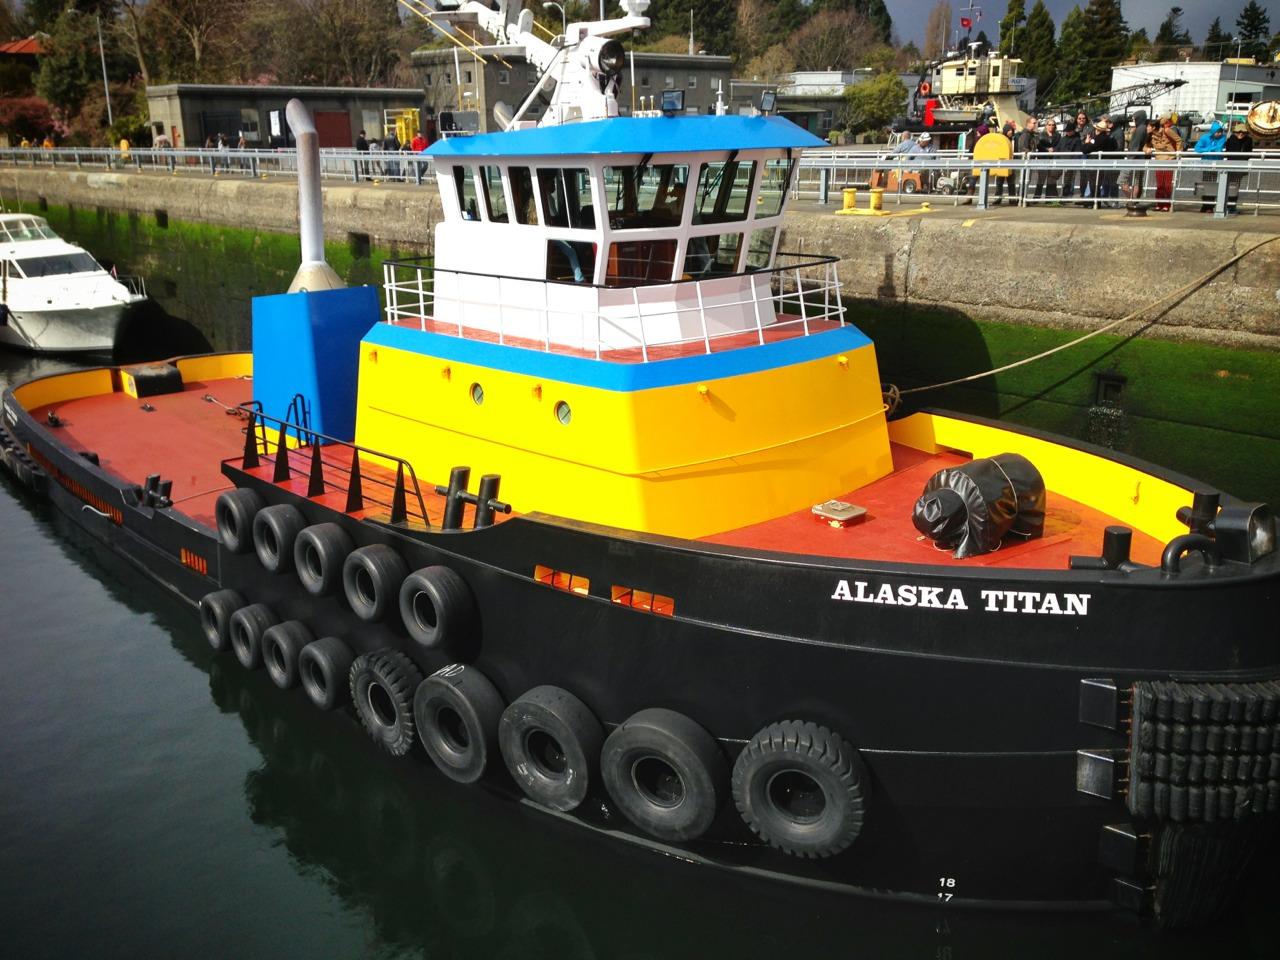 Alaskan Titan